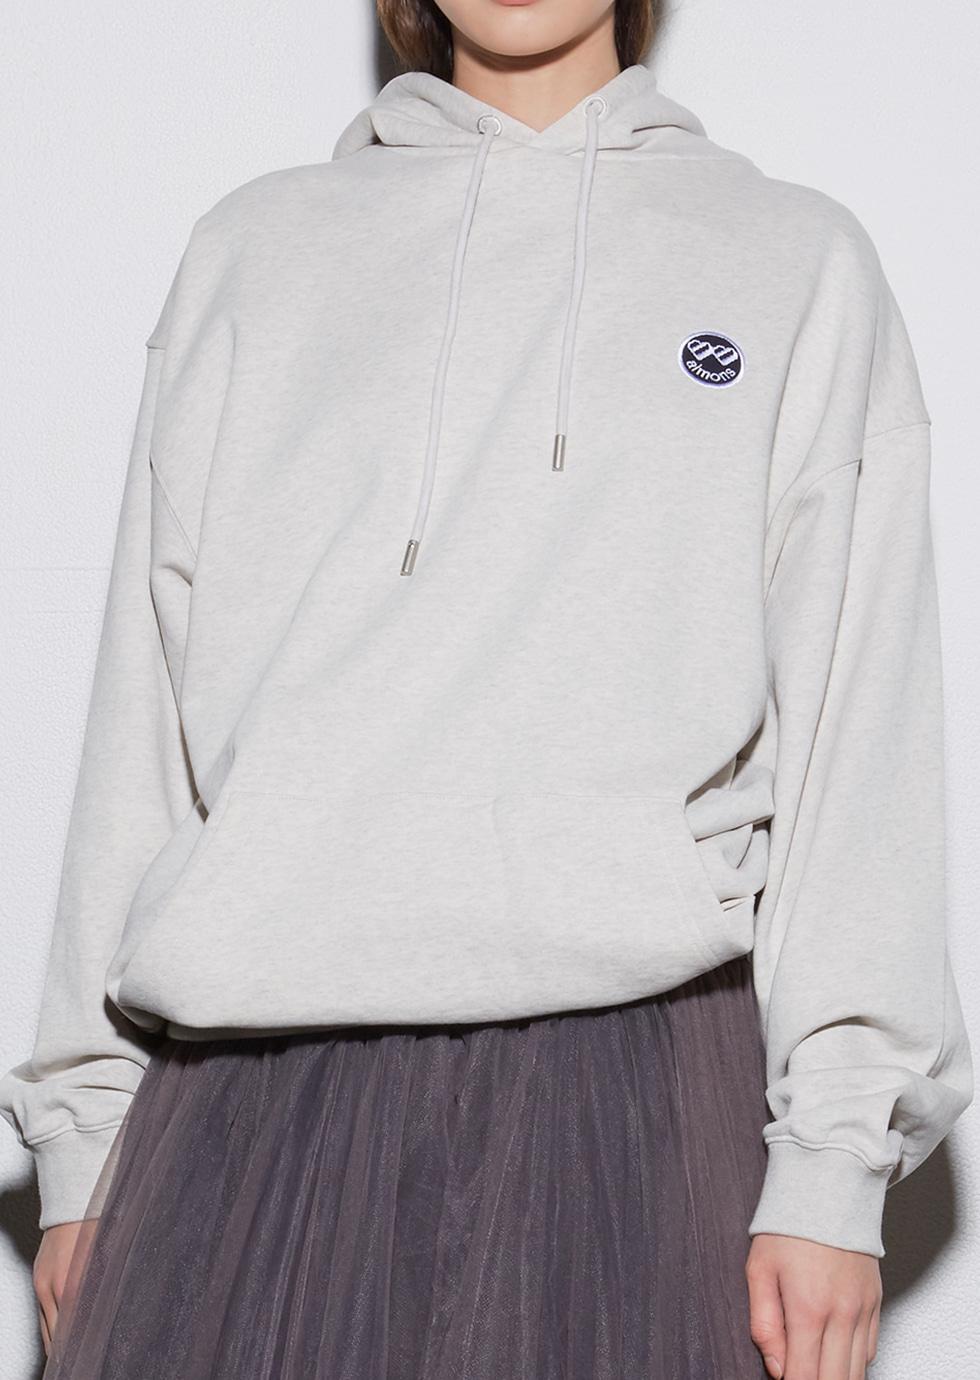 Melange gray embroidery wappen hoodie - 에몽 공식스토어  aimons